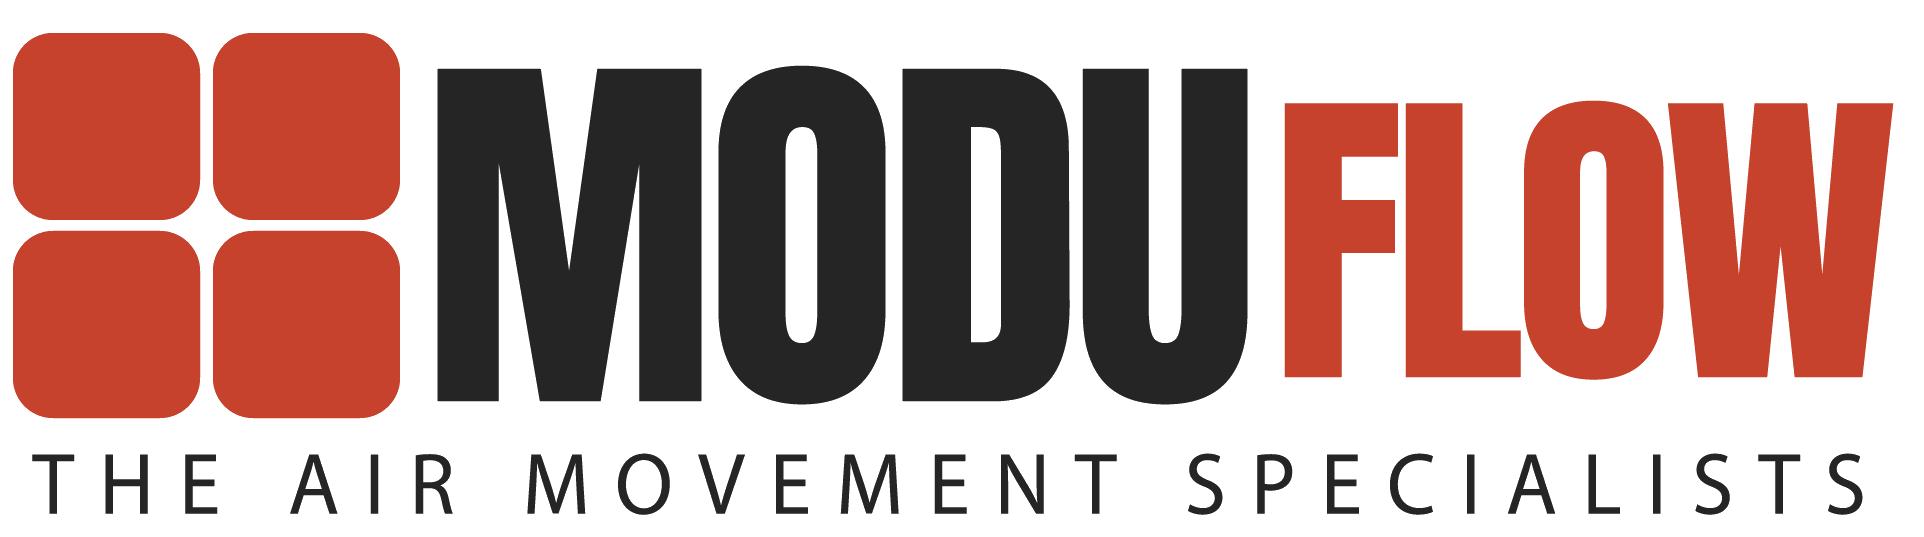 Industrial Fans: Design, Manufacture & Supply | Moduflow